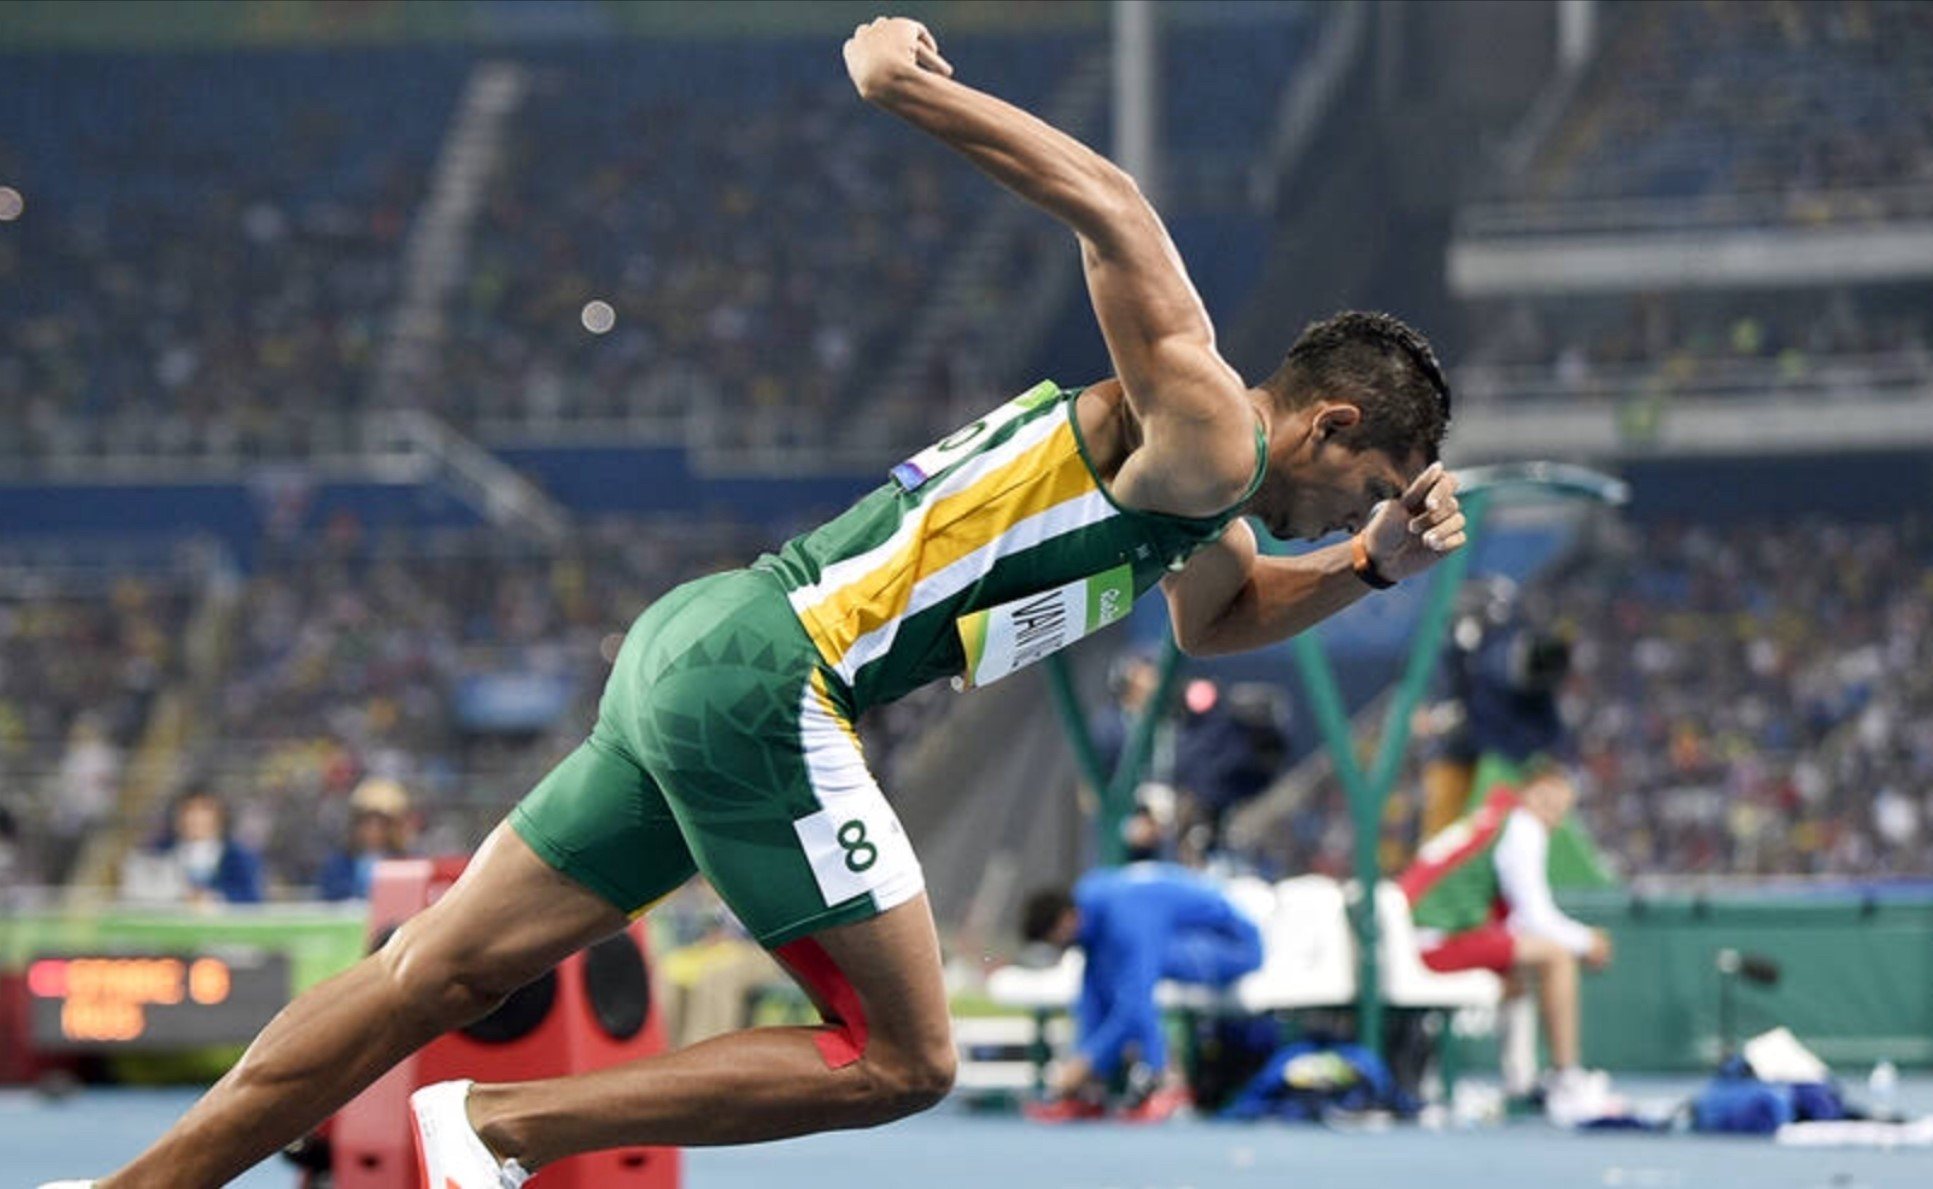 Wayde van Niekerk setting off to break the 400m world record at the Rio Olympics in 2016.